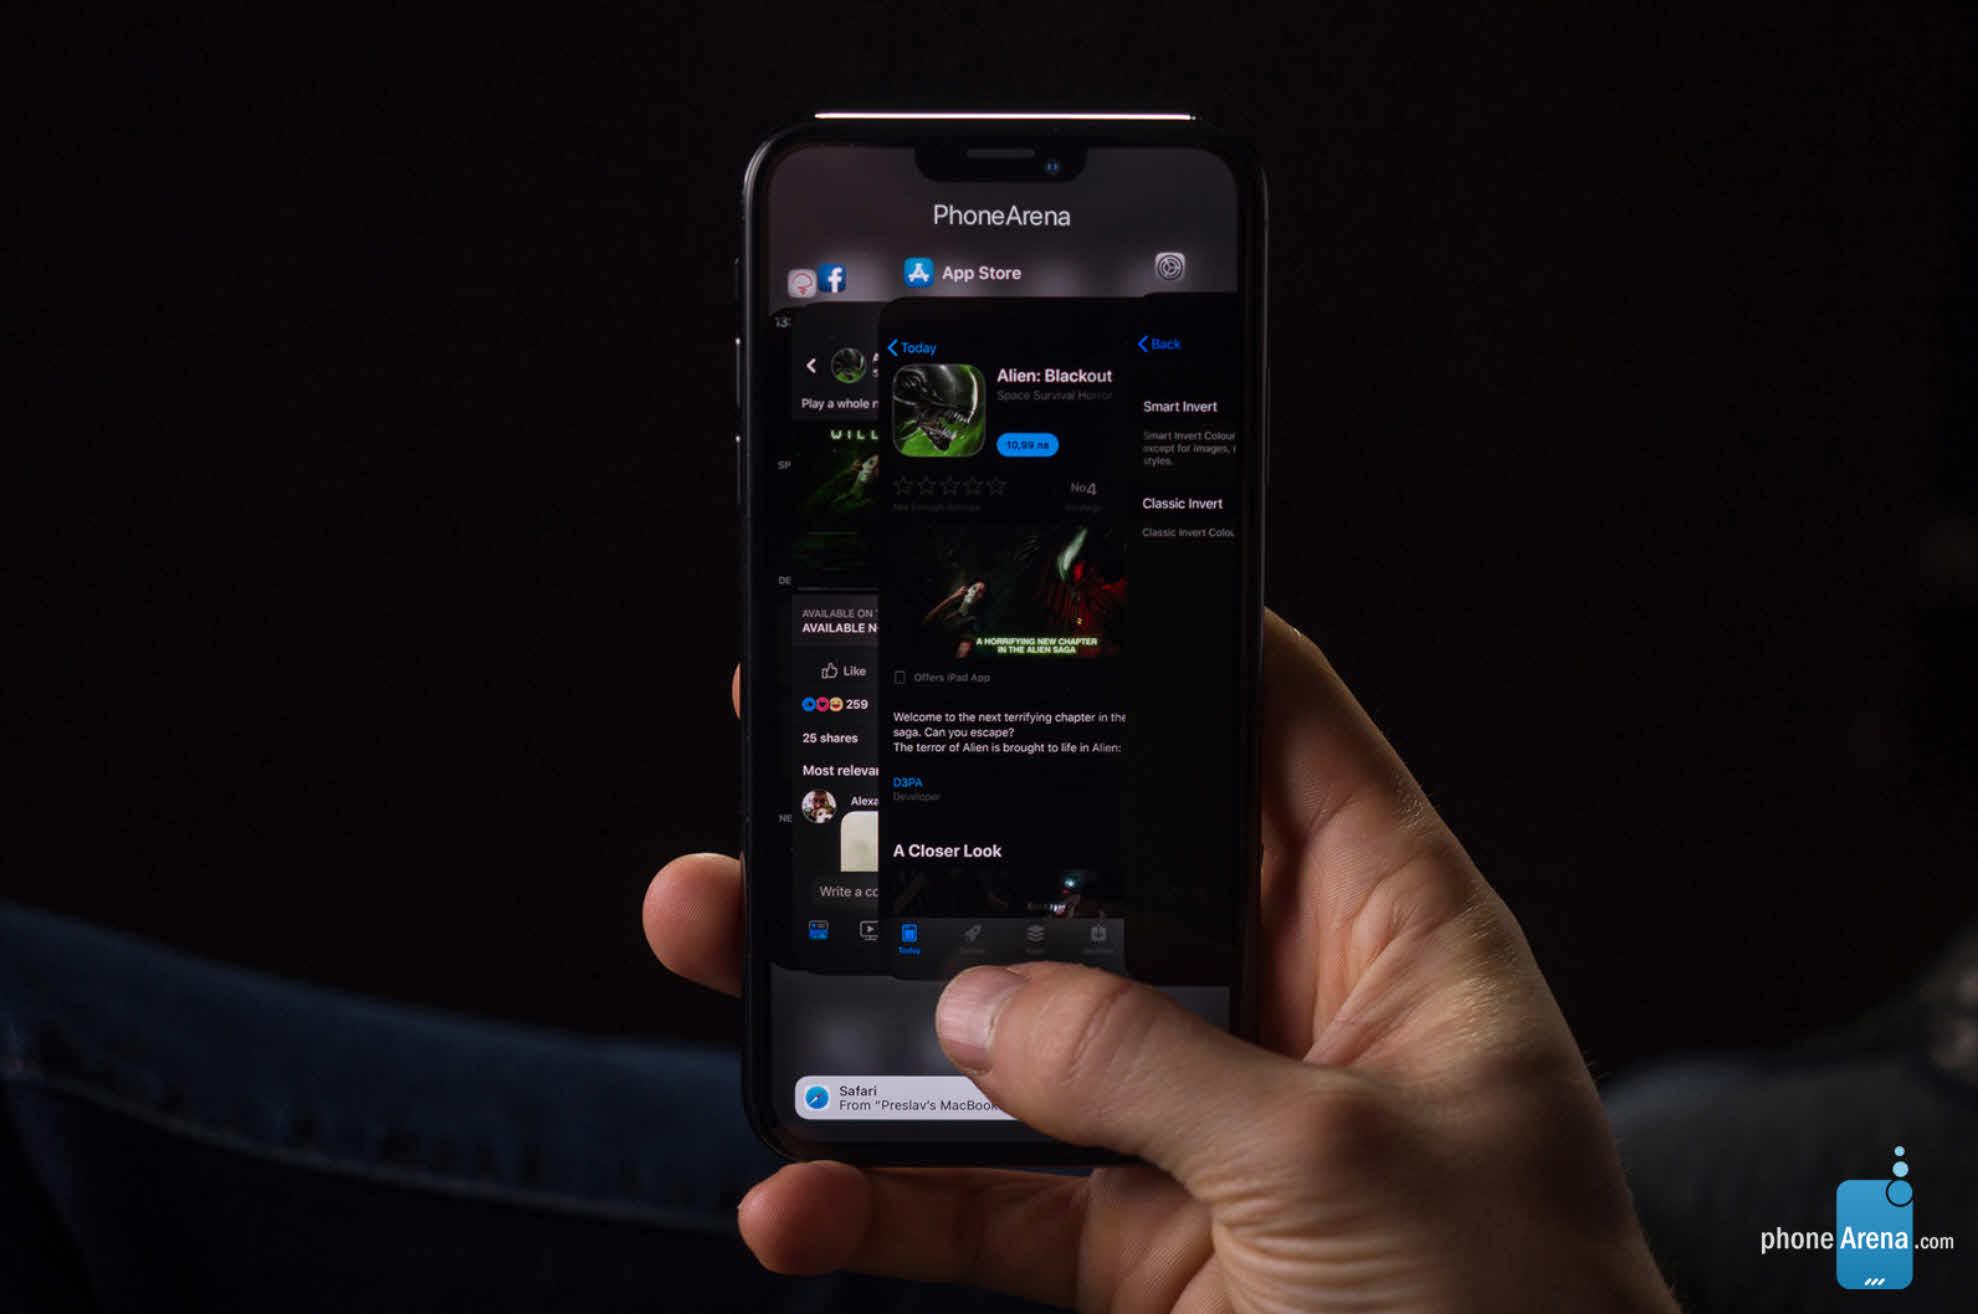 Phonearena Iphone Xi Ios 13 Darkmode Render Img 1 6